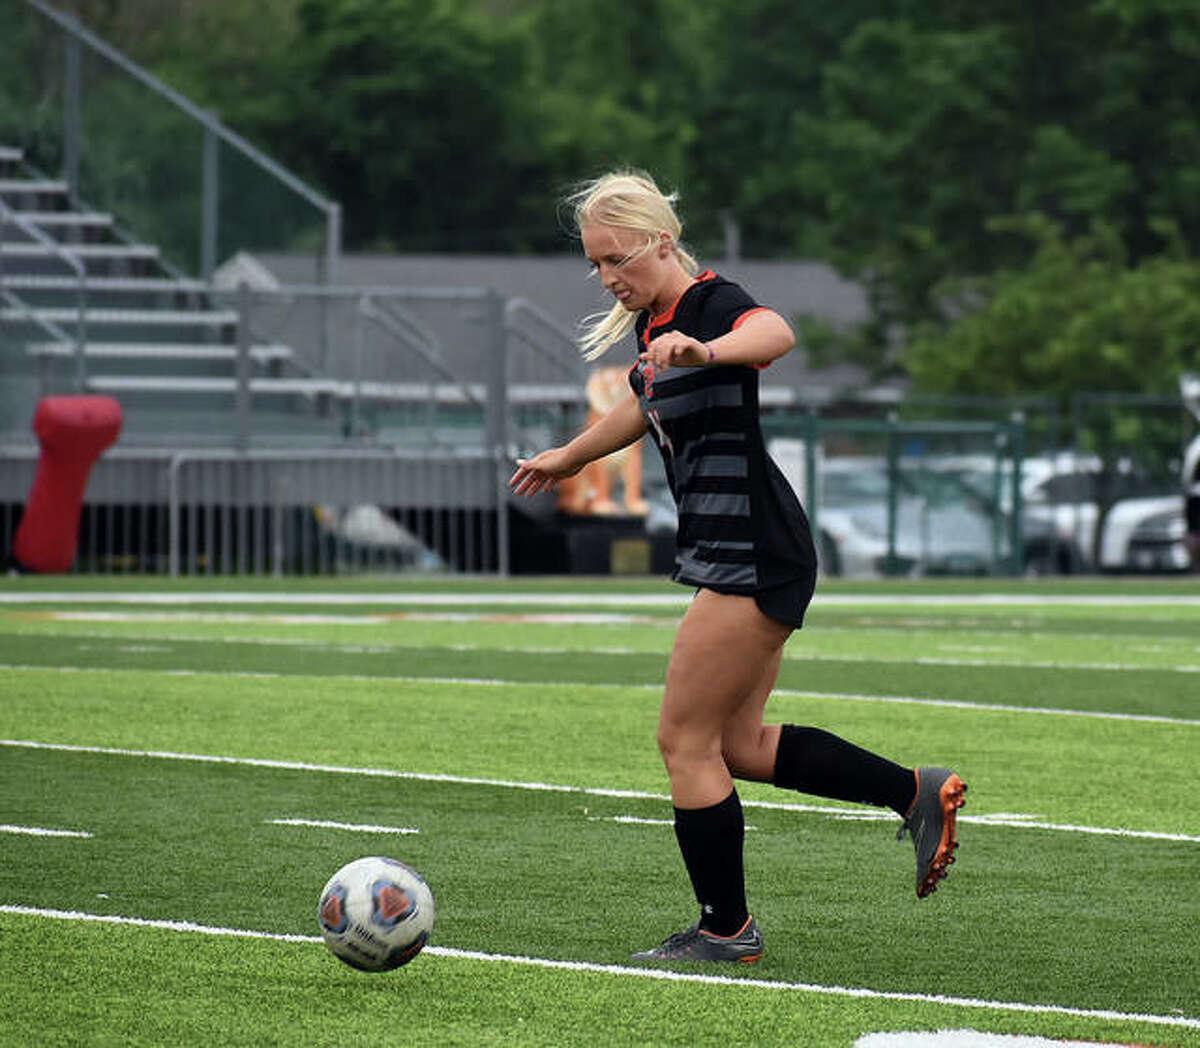 Edwardsville senior Lydia Redmon plays a ball near midfield in the first half against Belleville West.